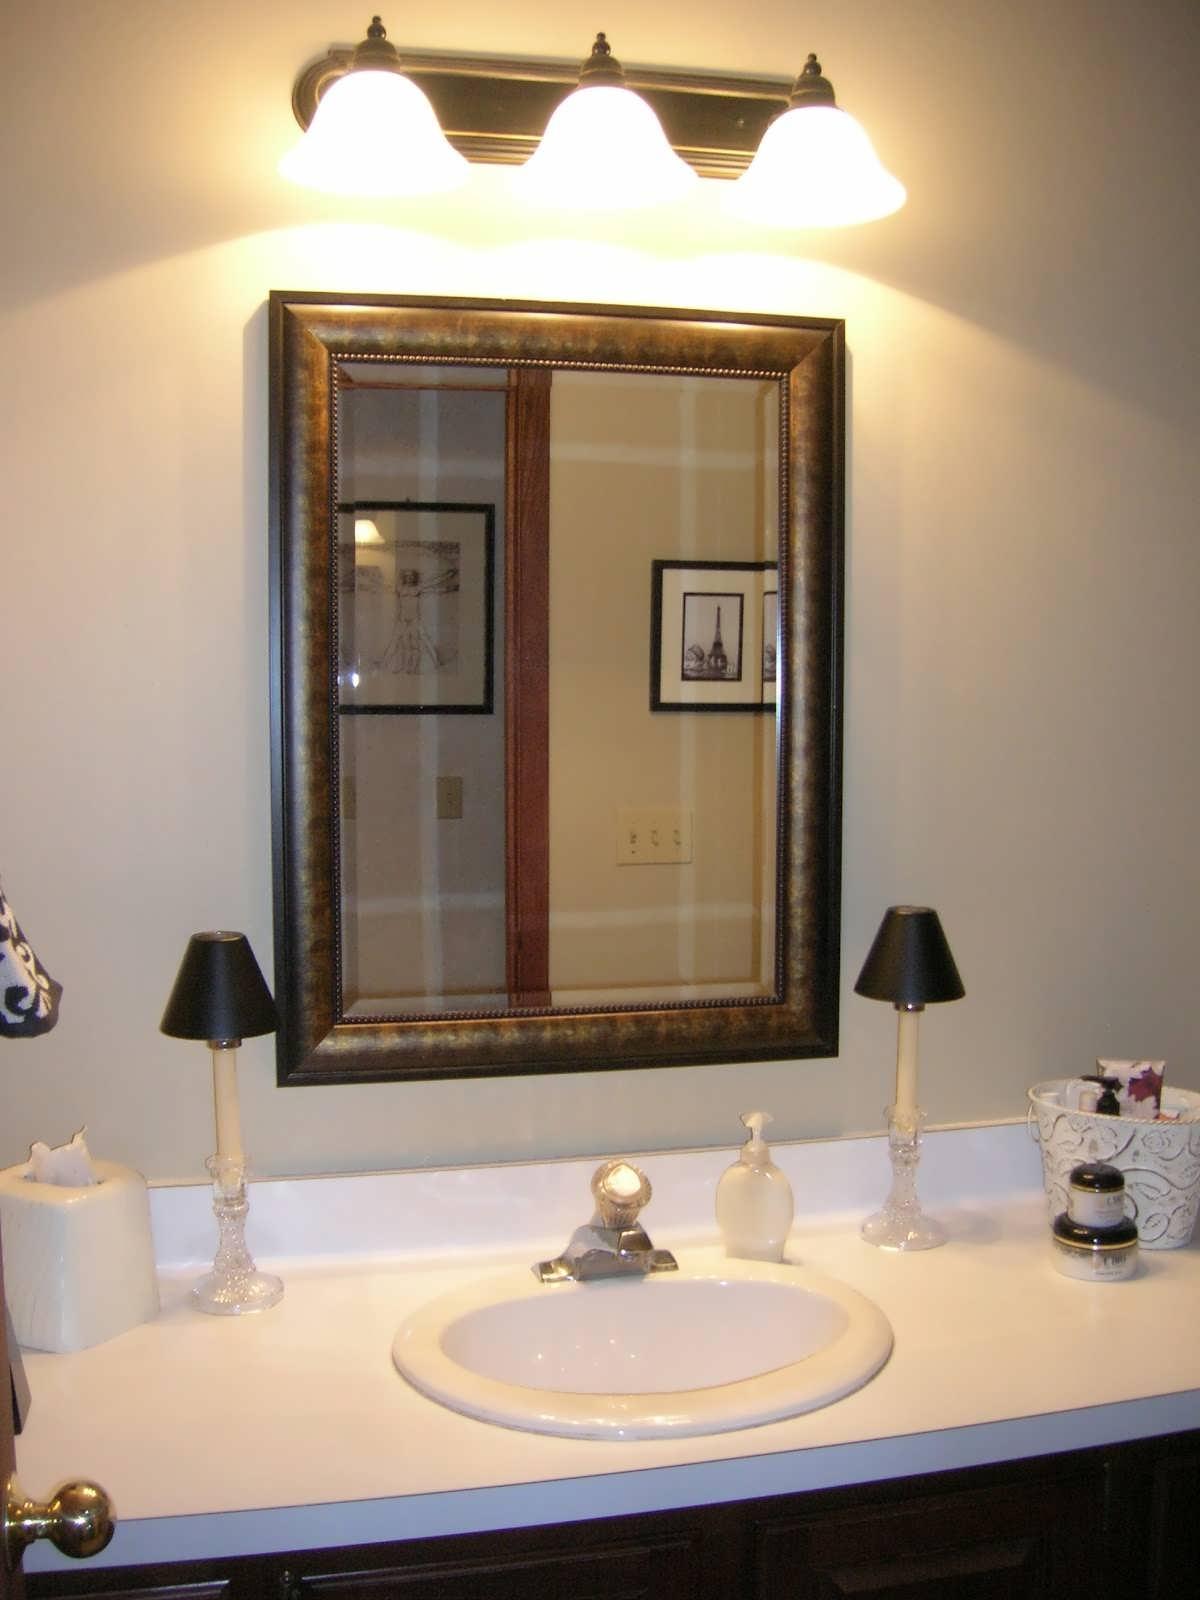 Bathroom 2 Light Vanity Lights Elegant Vanity Lighting Modern For Bathroom Lighting Chandeliers (Image 3 of 25)